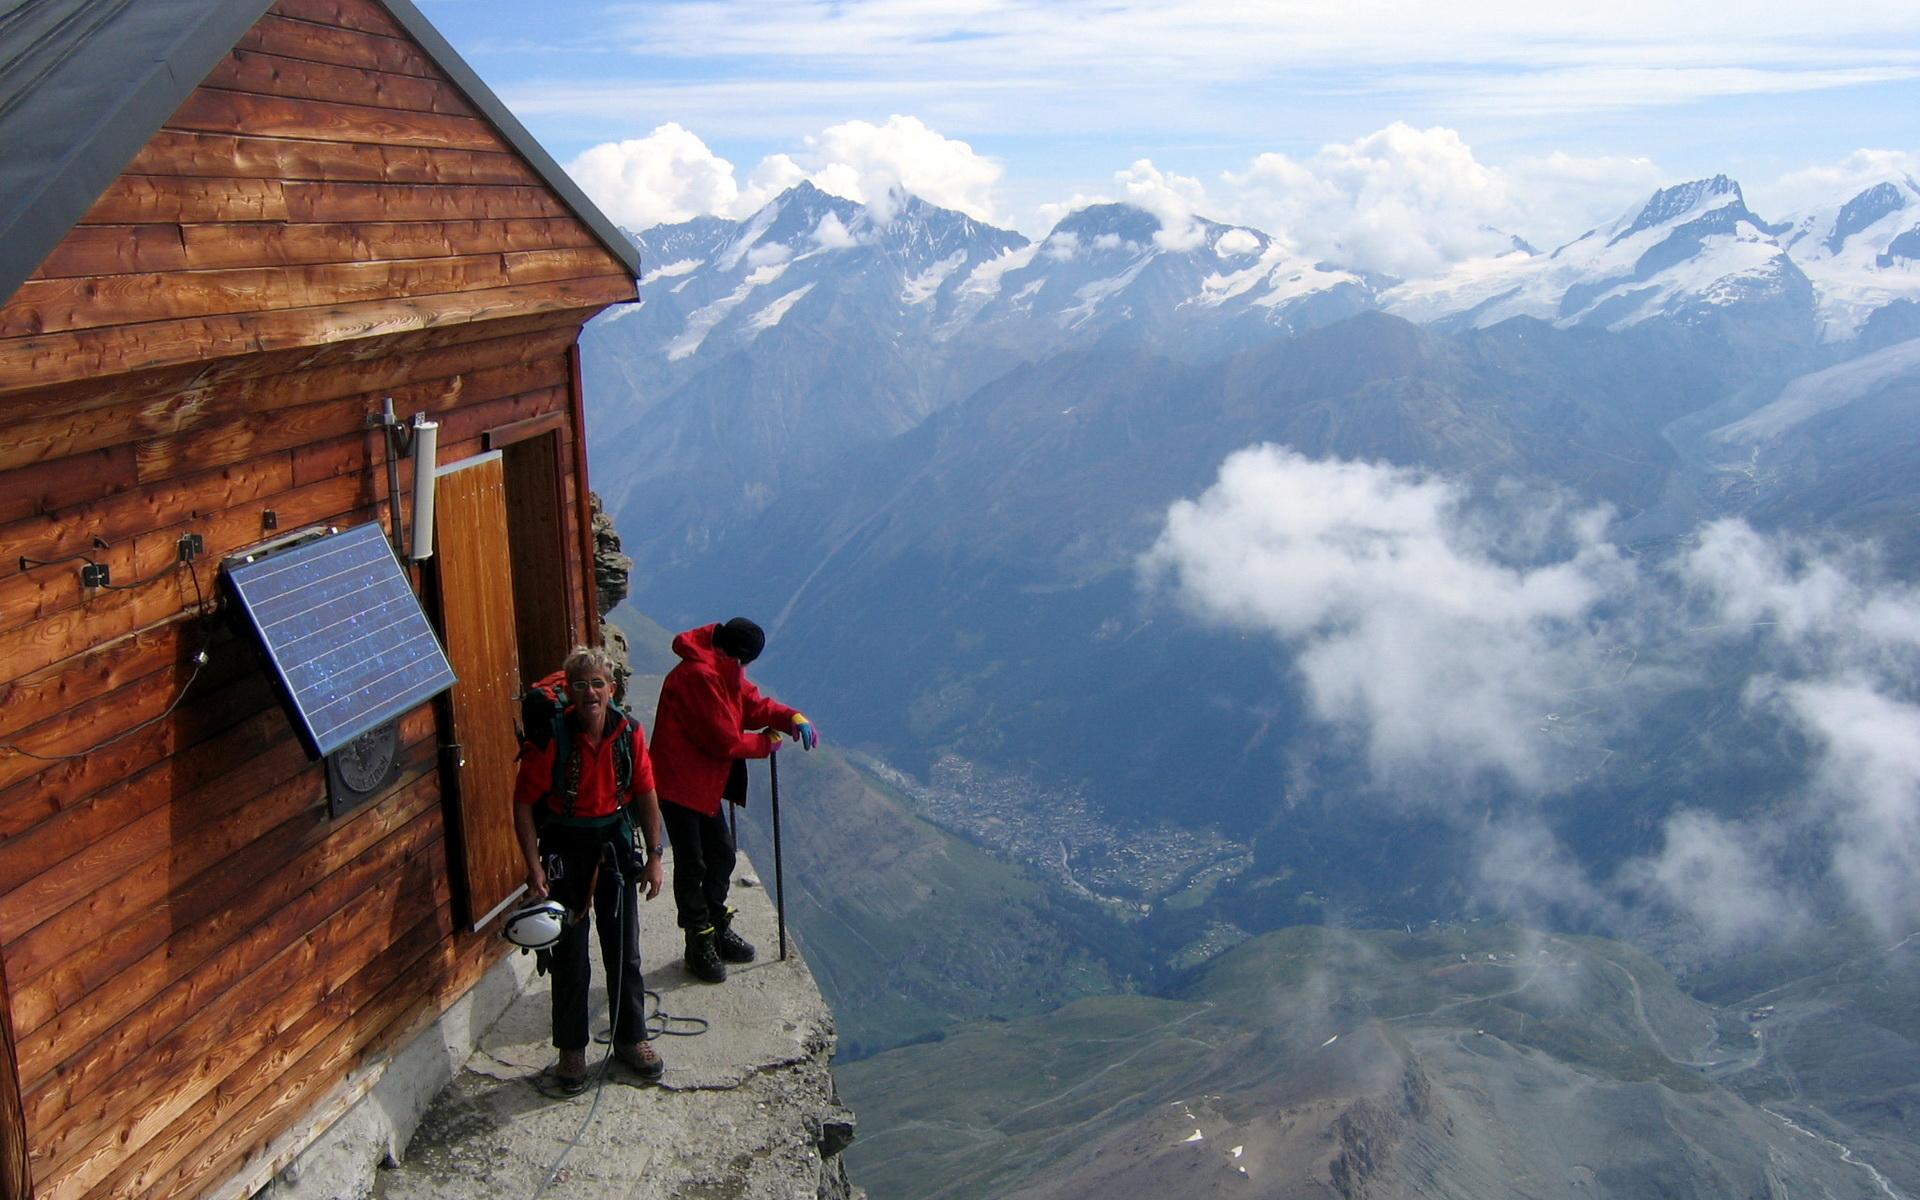 Zermatt Switzerland  City pictures : Switzerland, Zermatt wallpapers and images wallpapers, pictures ...